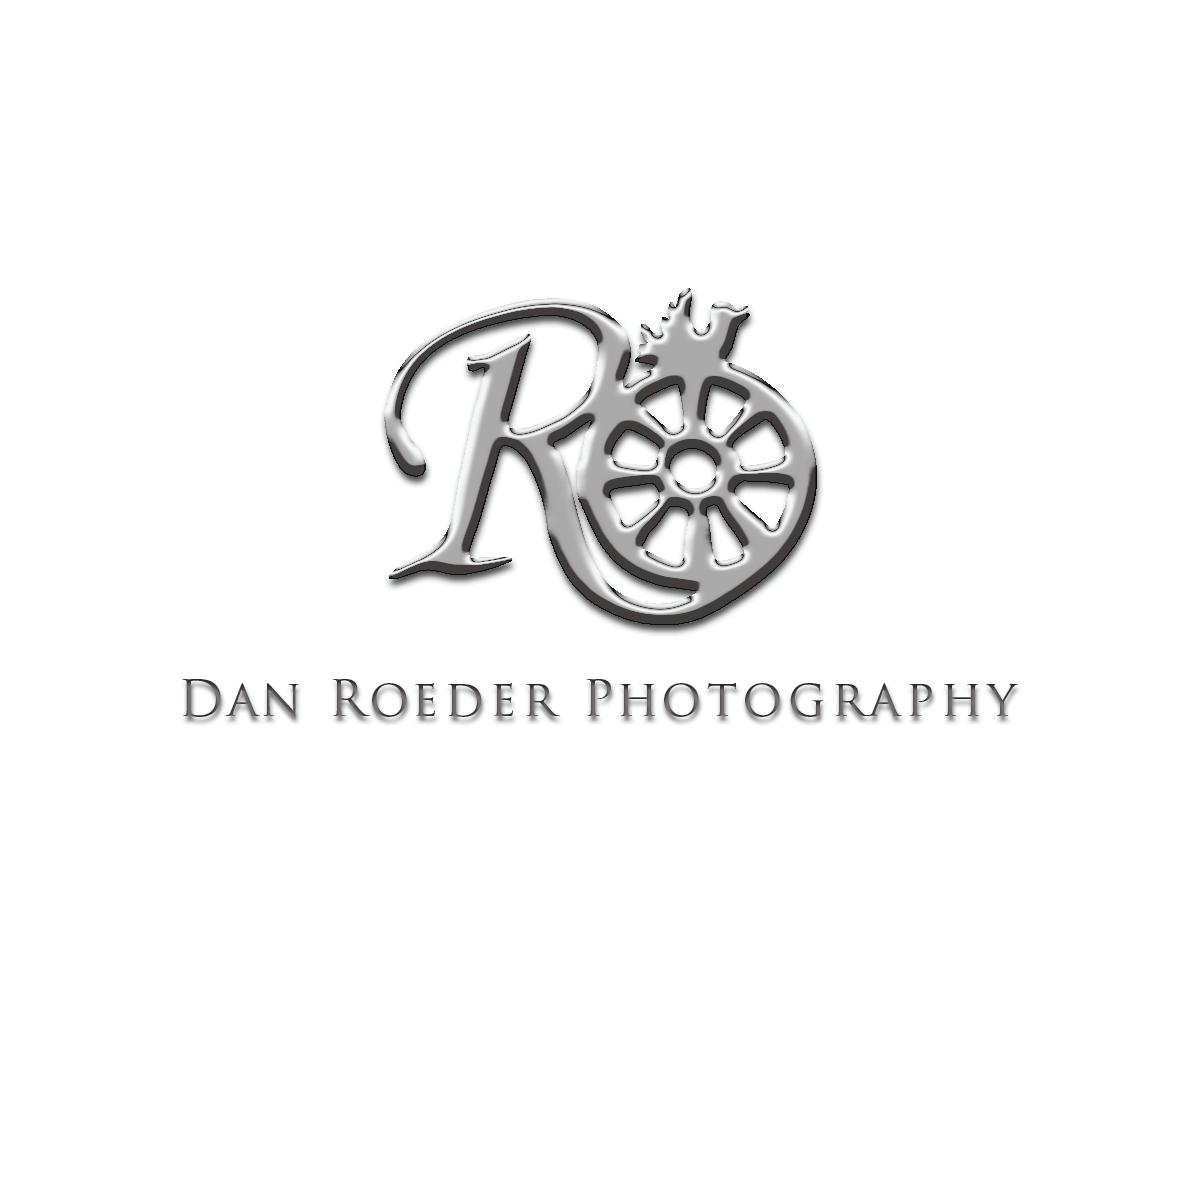 Dan Roeder Photography